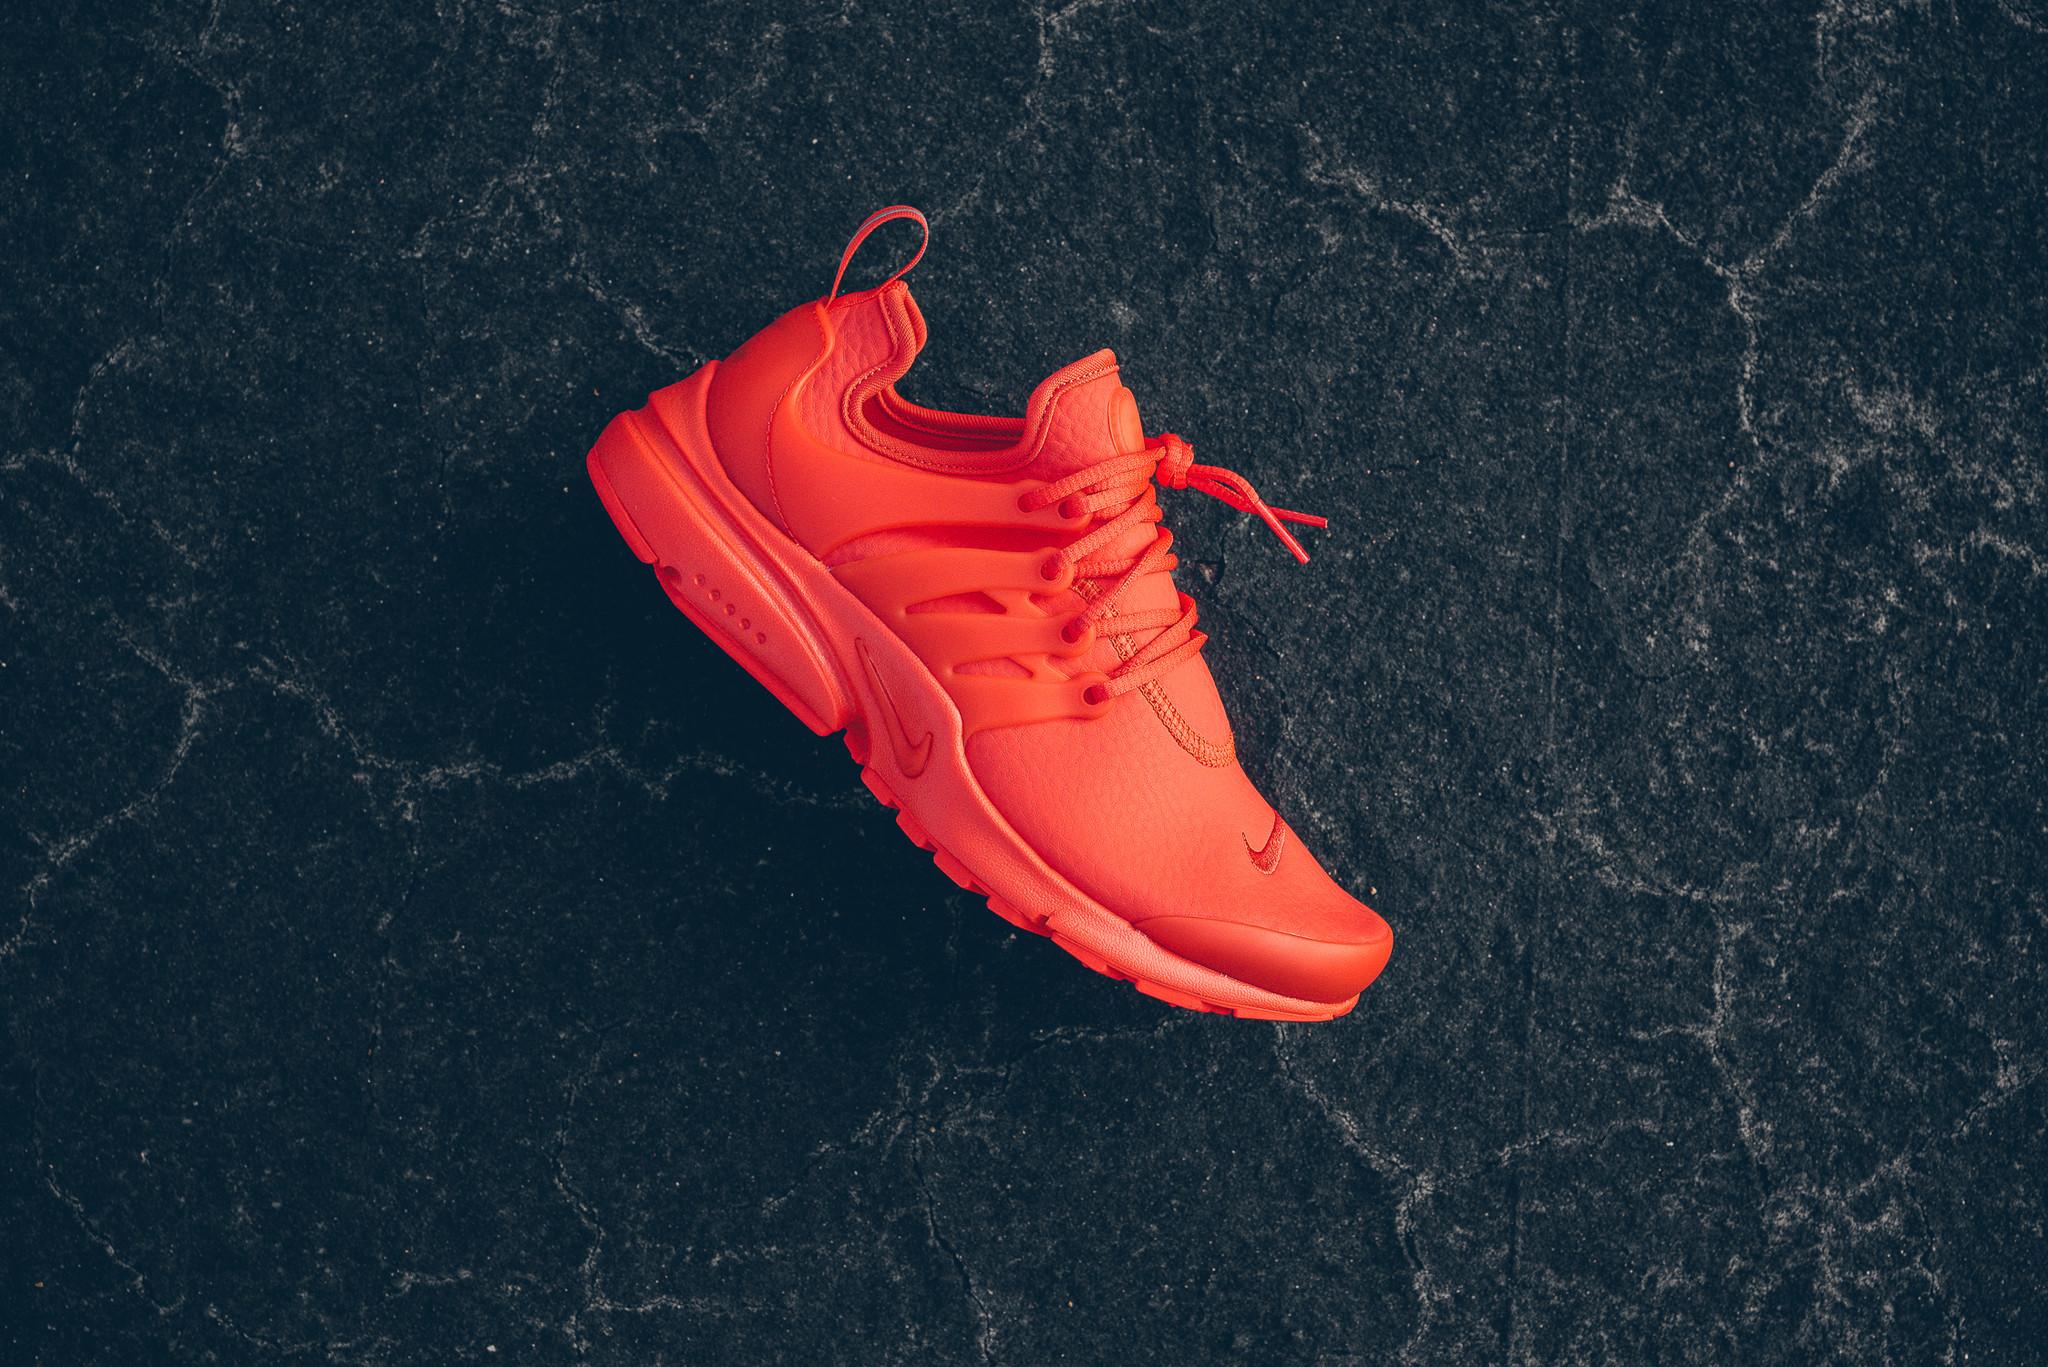 WMNS_Nike_Air_Presto_PRM_Max_Orange_Sneaker_Politics_HypeBeast_5